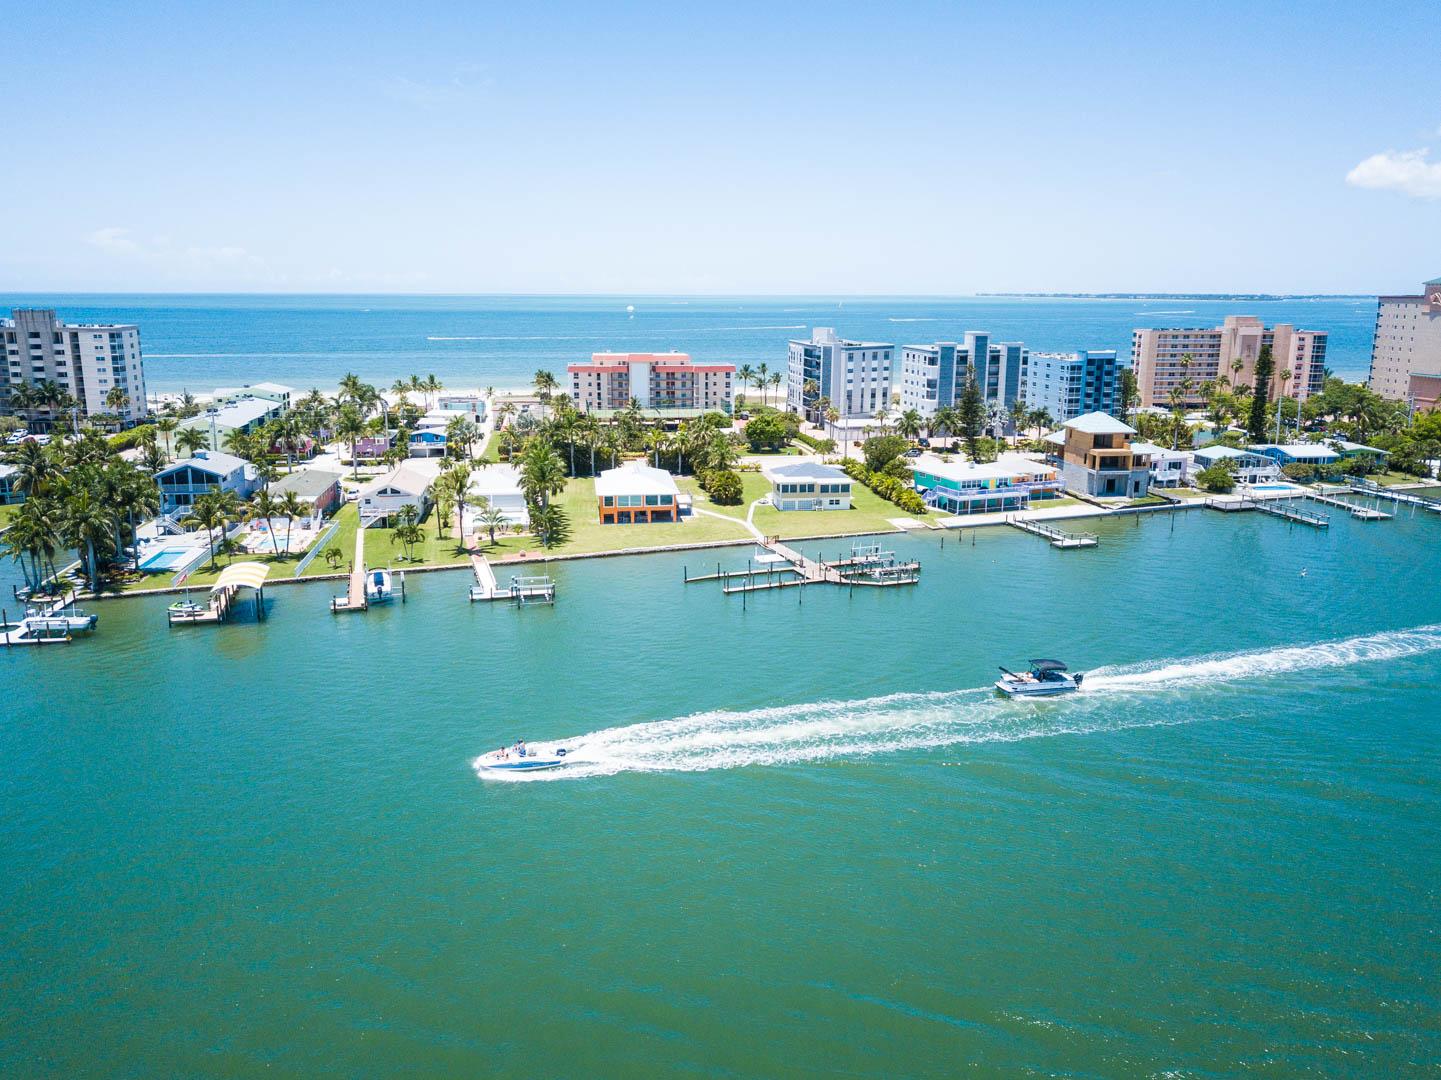 The scenic beach at VRI's Windward Passage Resort in Fort Myers Beach, Florida.